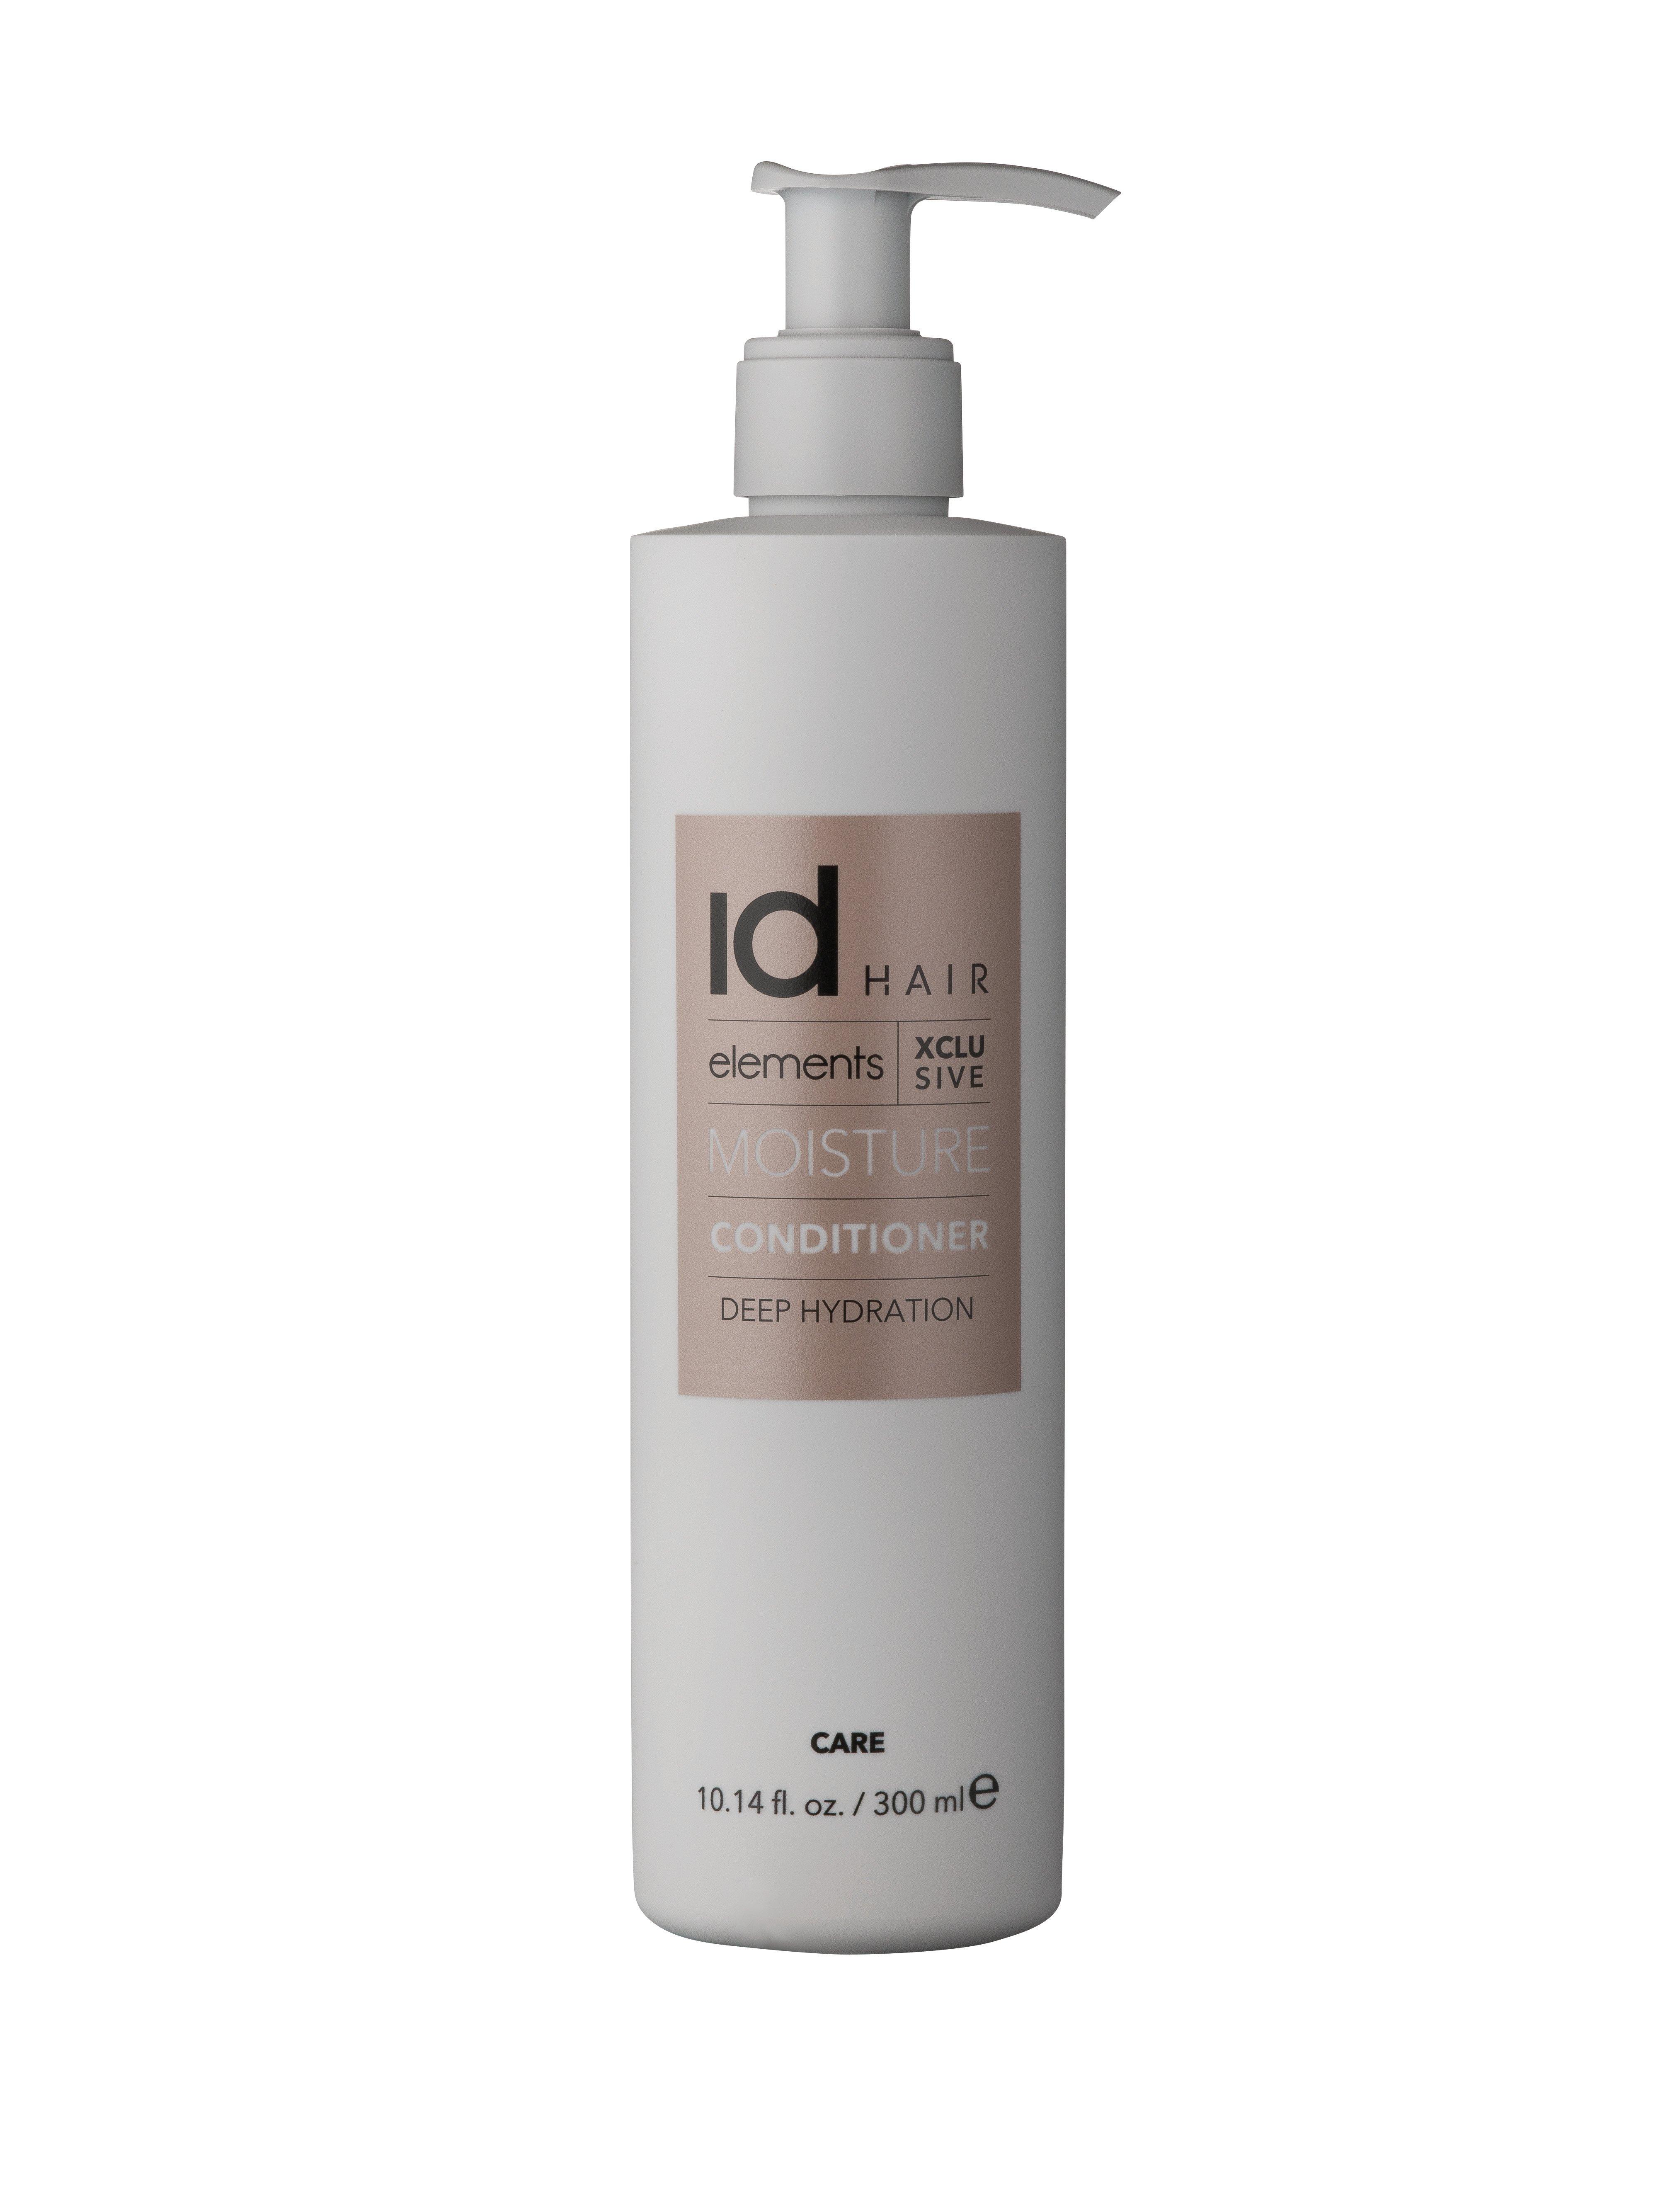 IdHAIR - Elements Xclusive Moisture Conditioner 300 ml